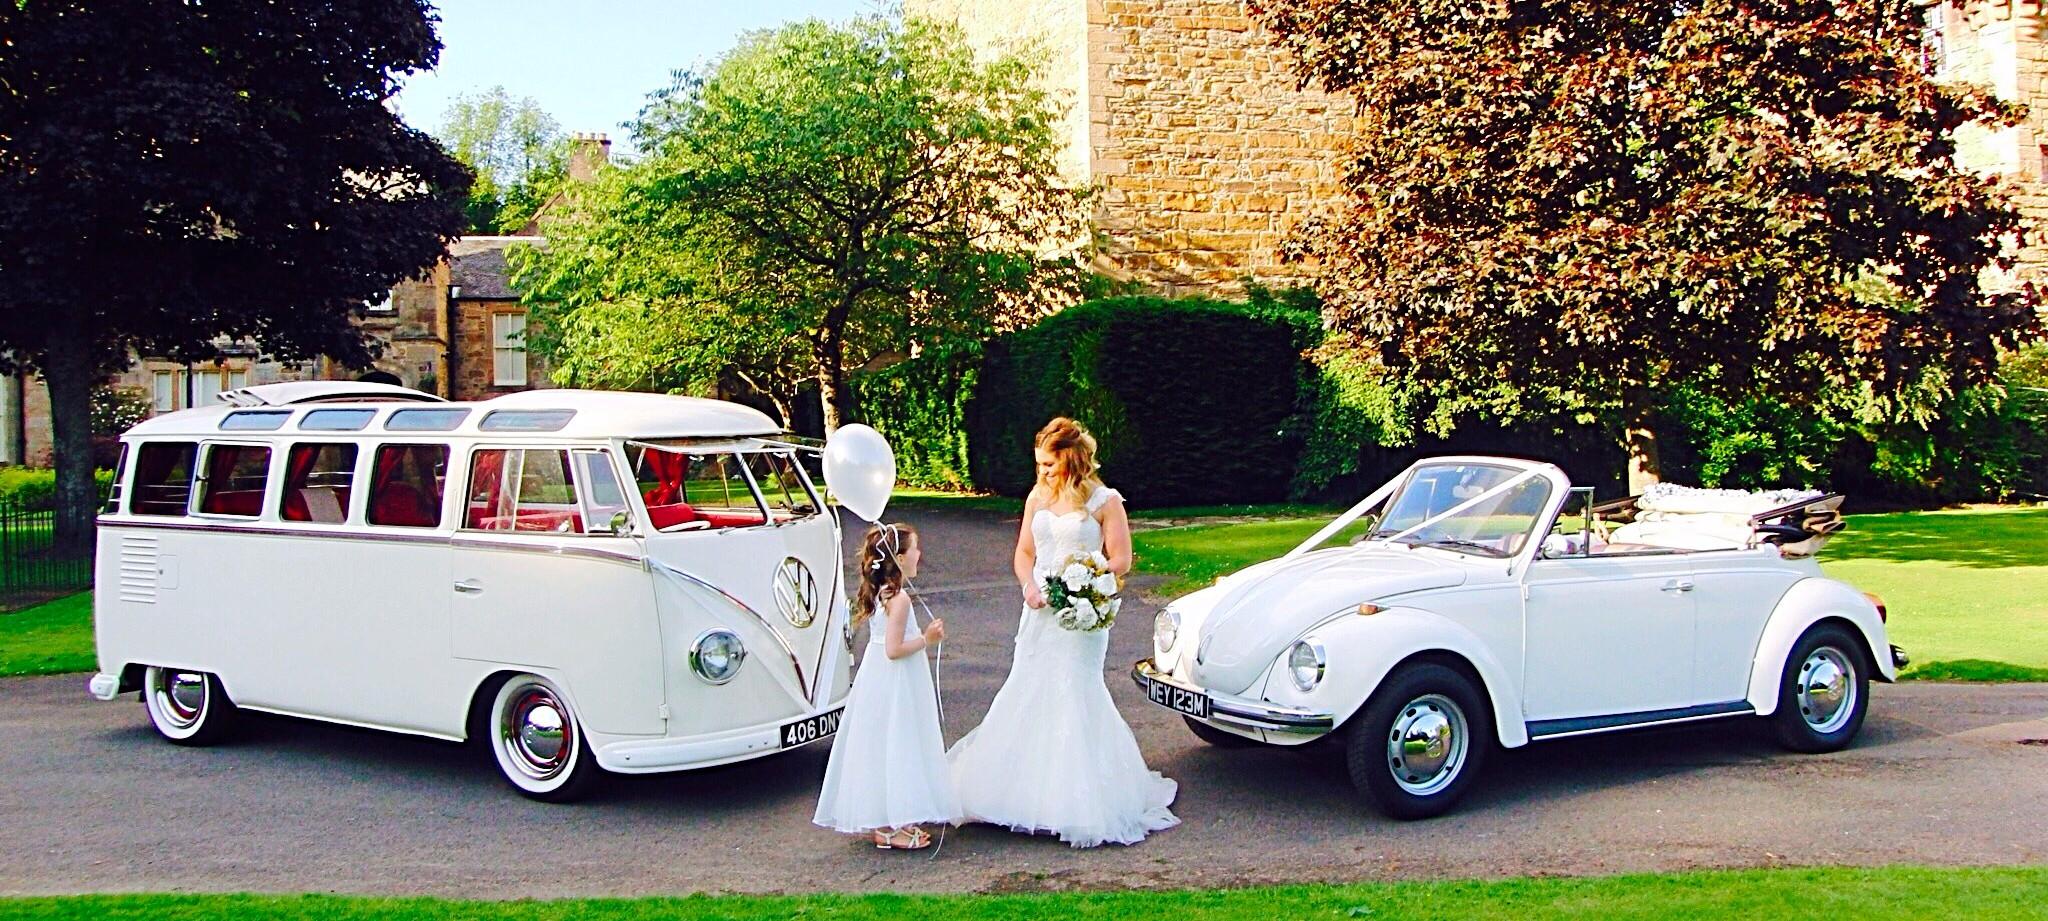 Home Ayrshire Vw Camper Wedding Hire